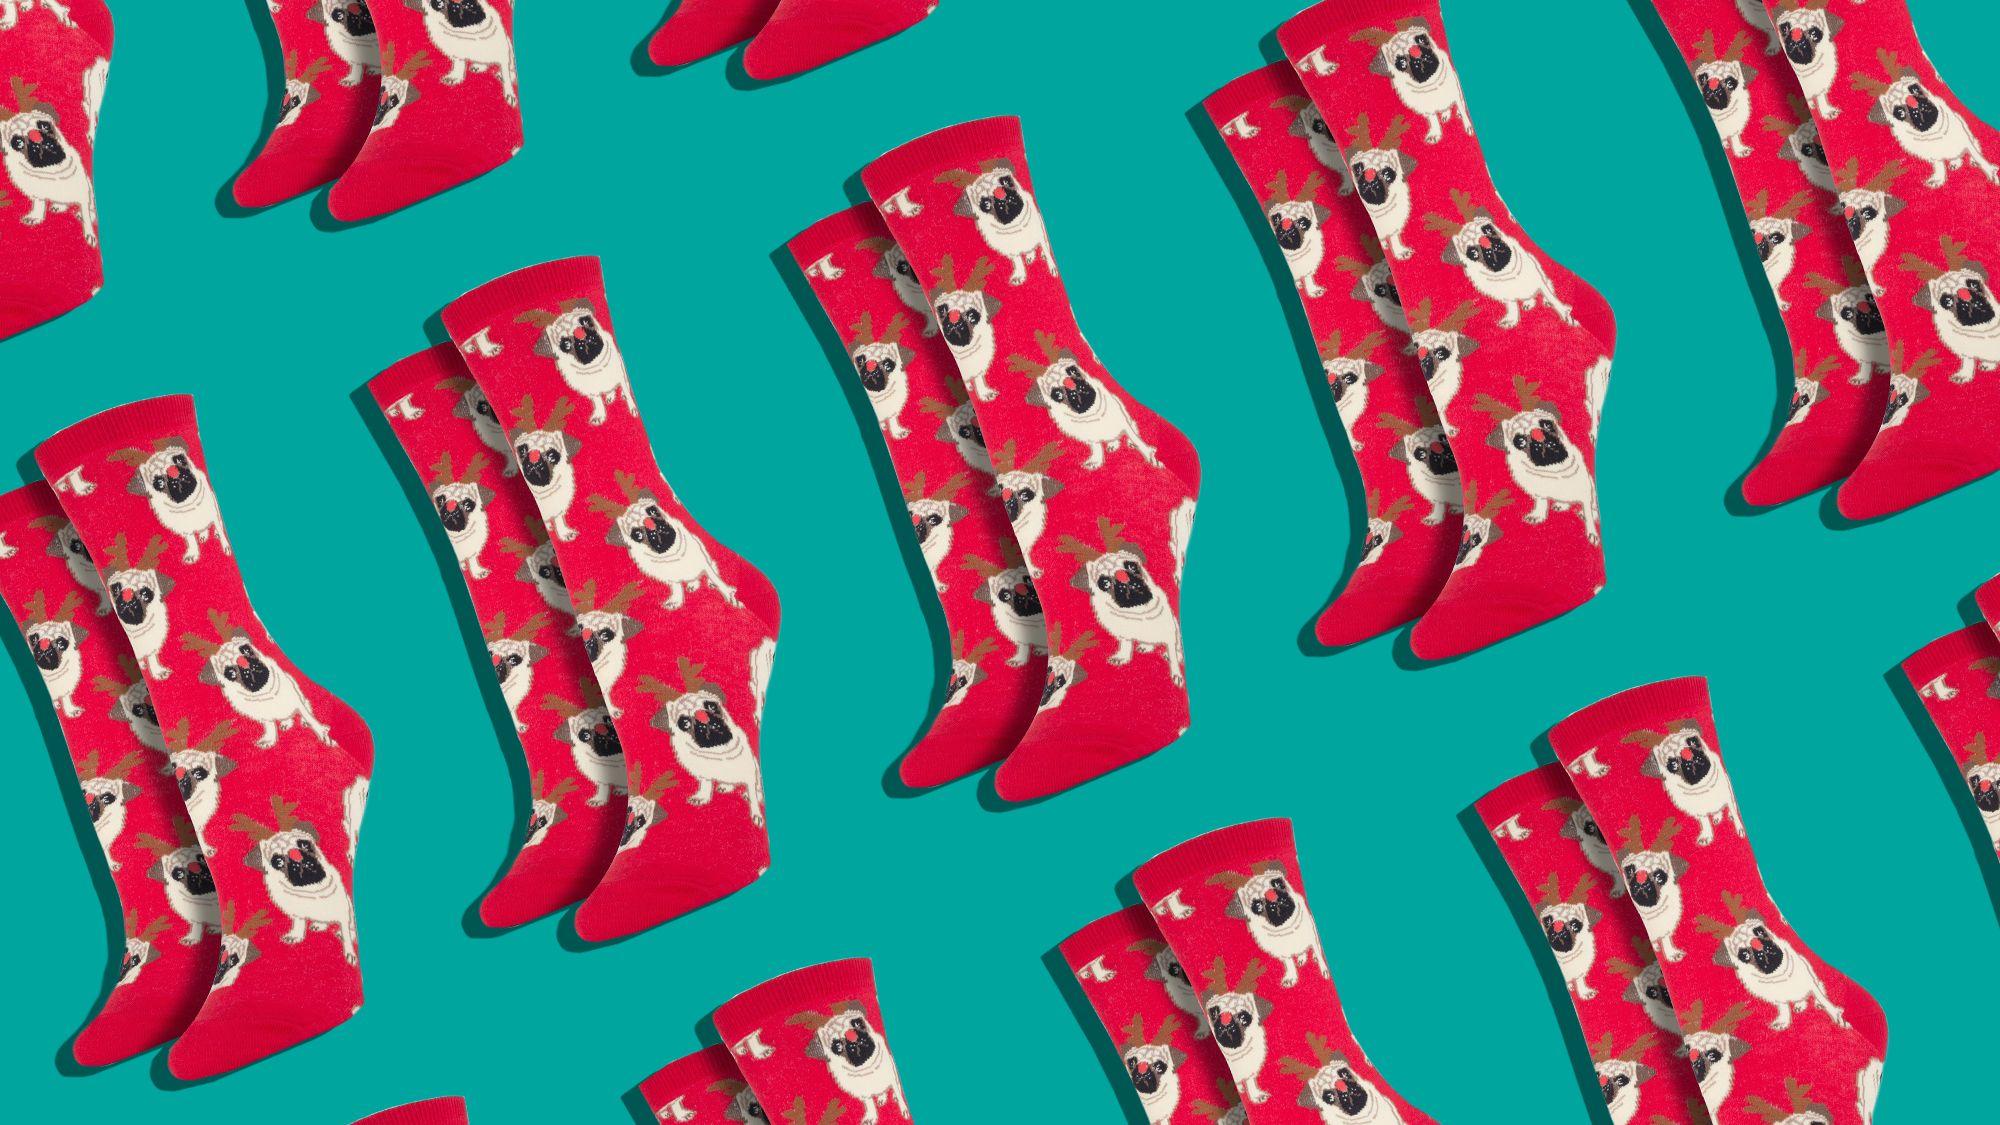 16 Best Christmas Socks for 2018 - Cute Holiday & Christmas Socks